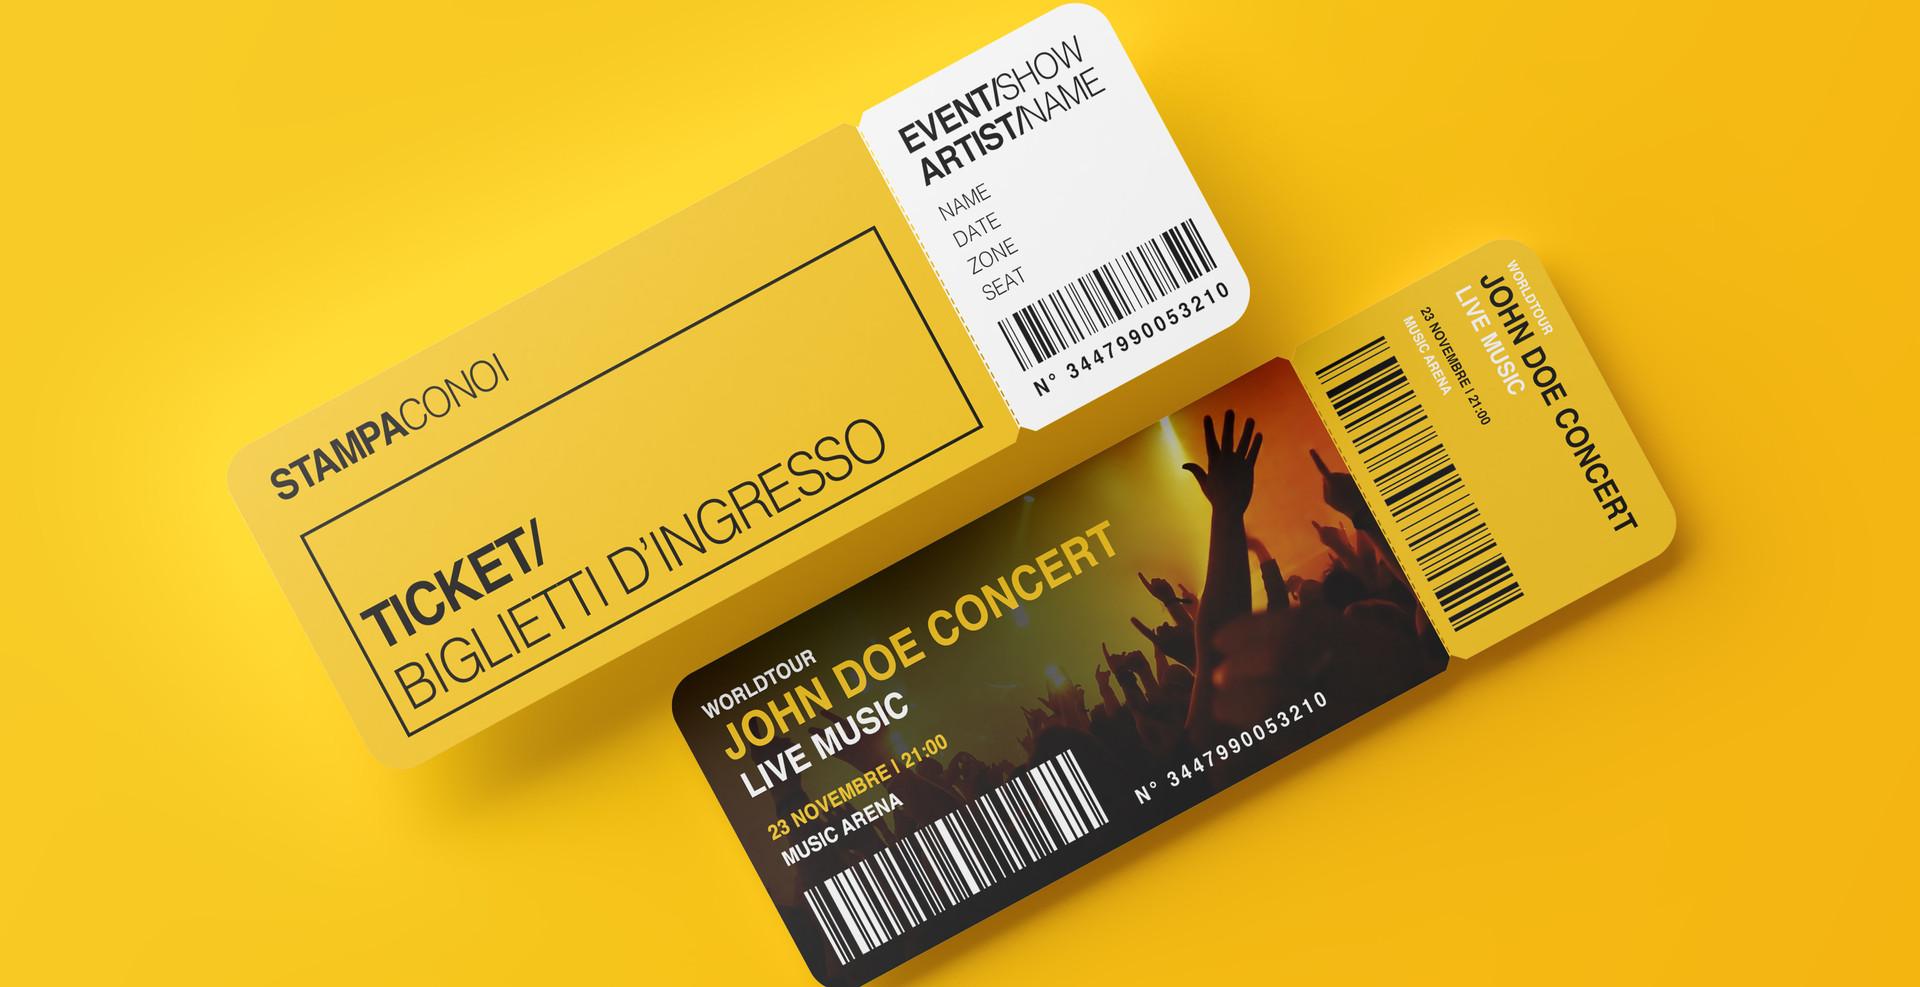 Biglietti d'ingresso